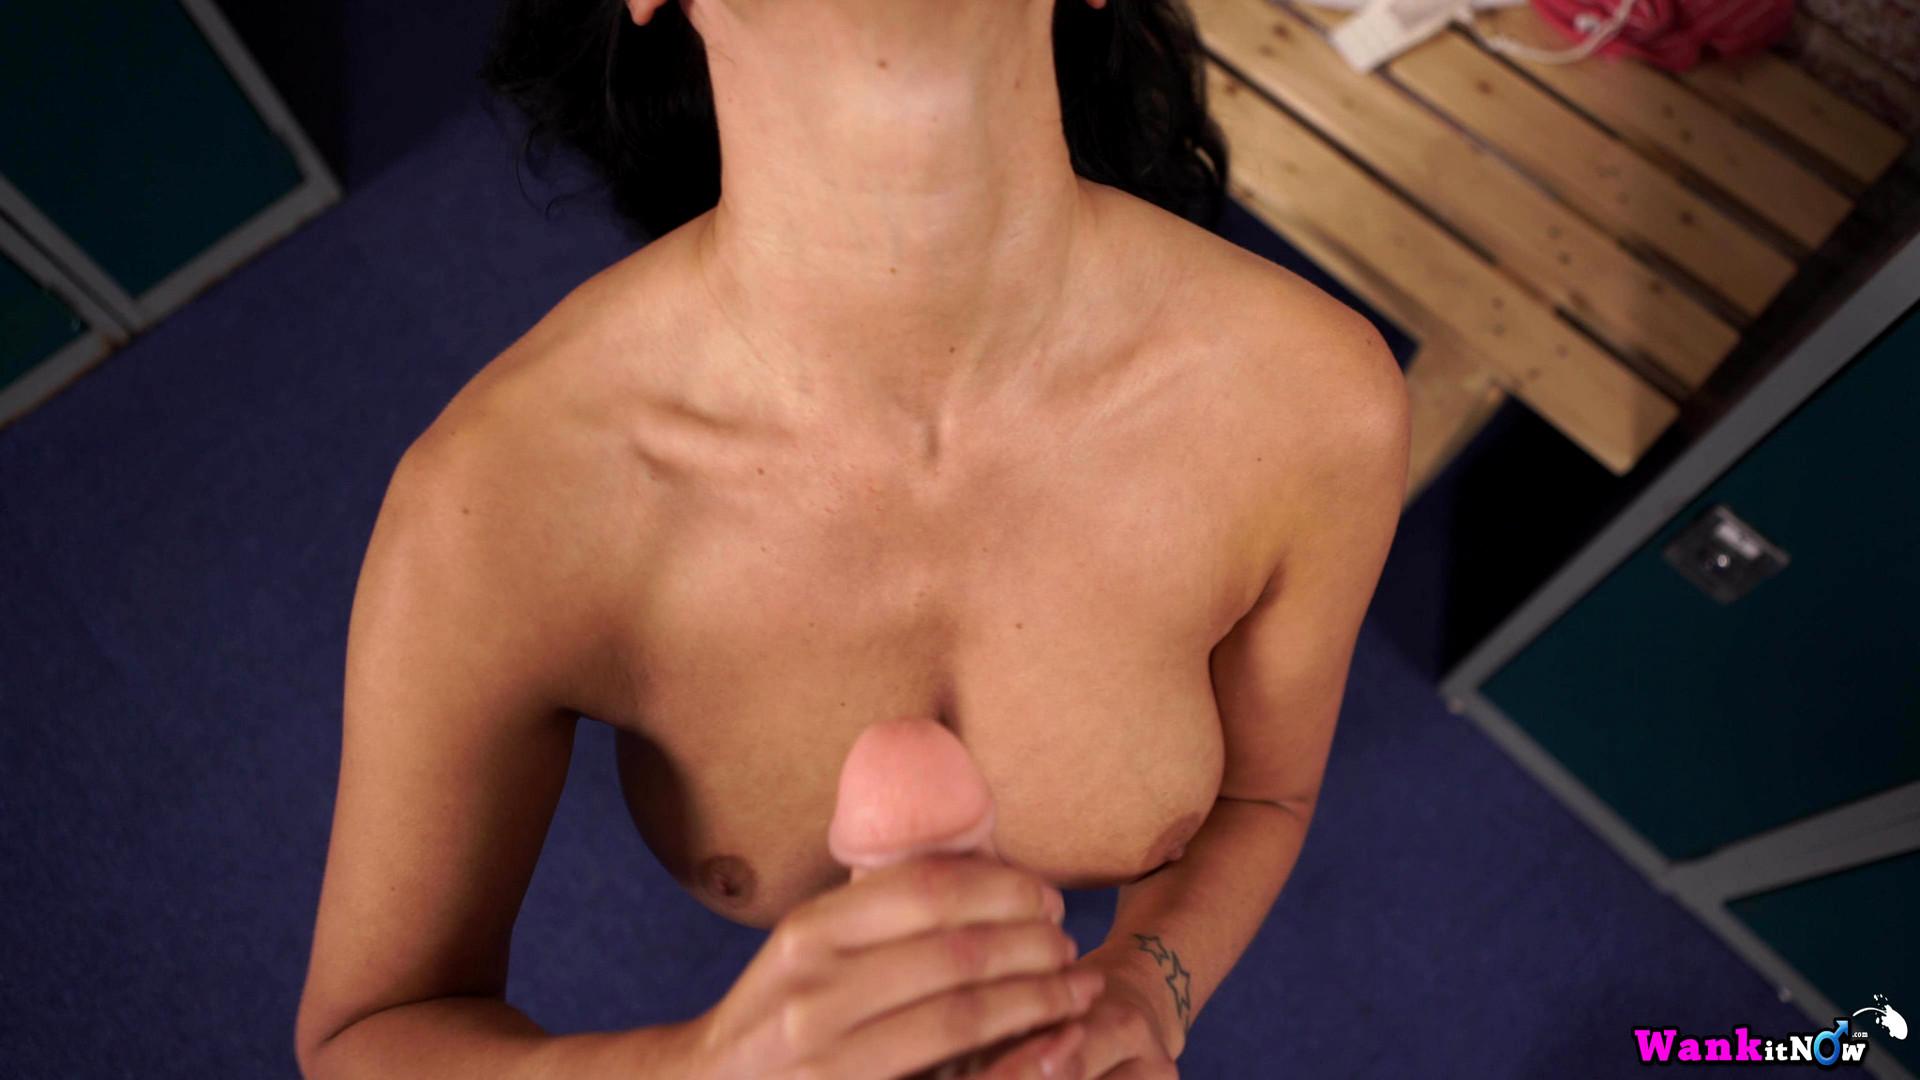 Pornhub jerk off